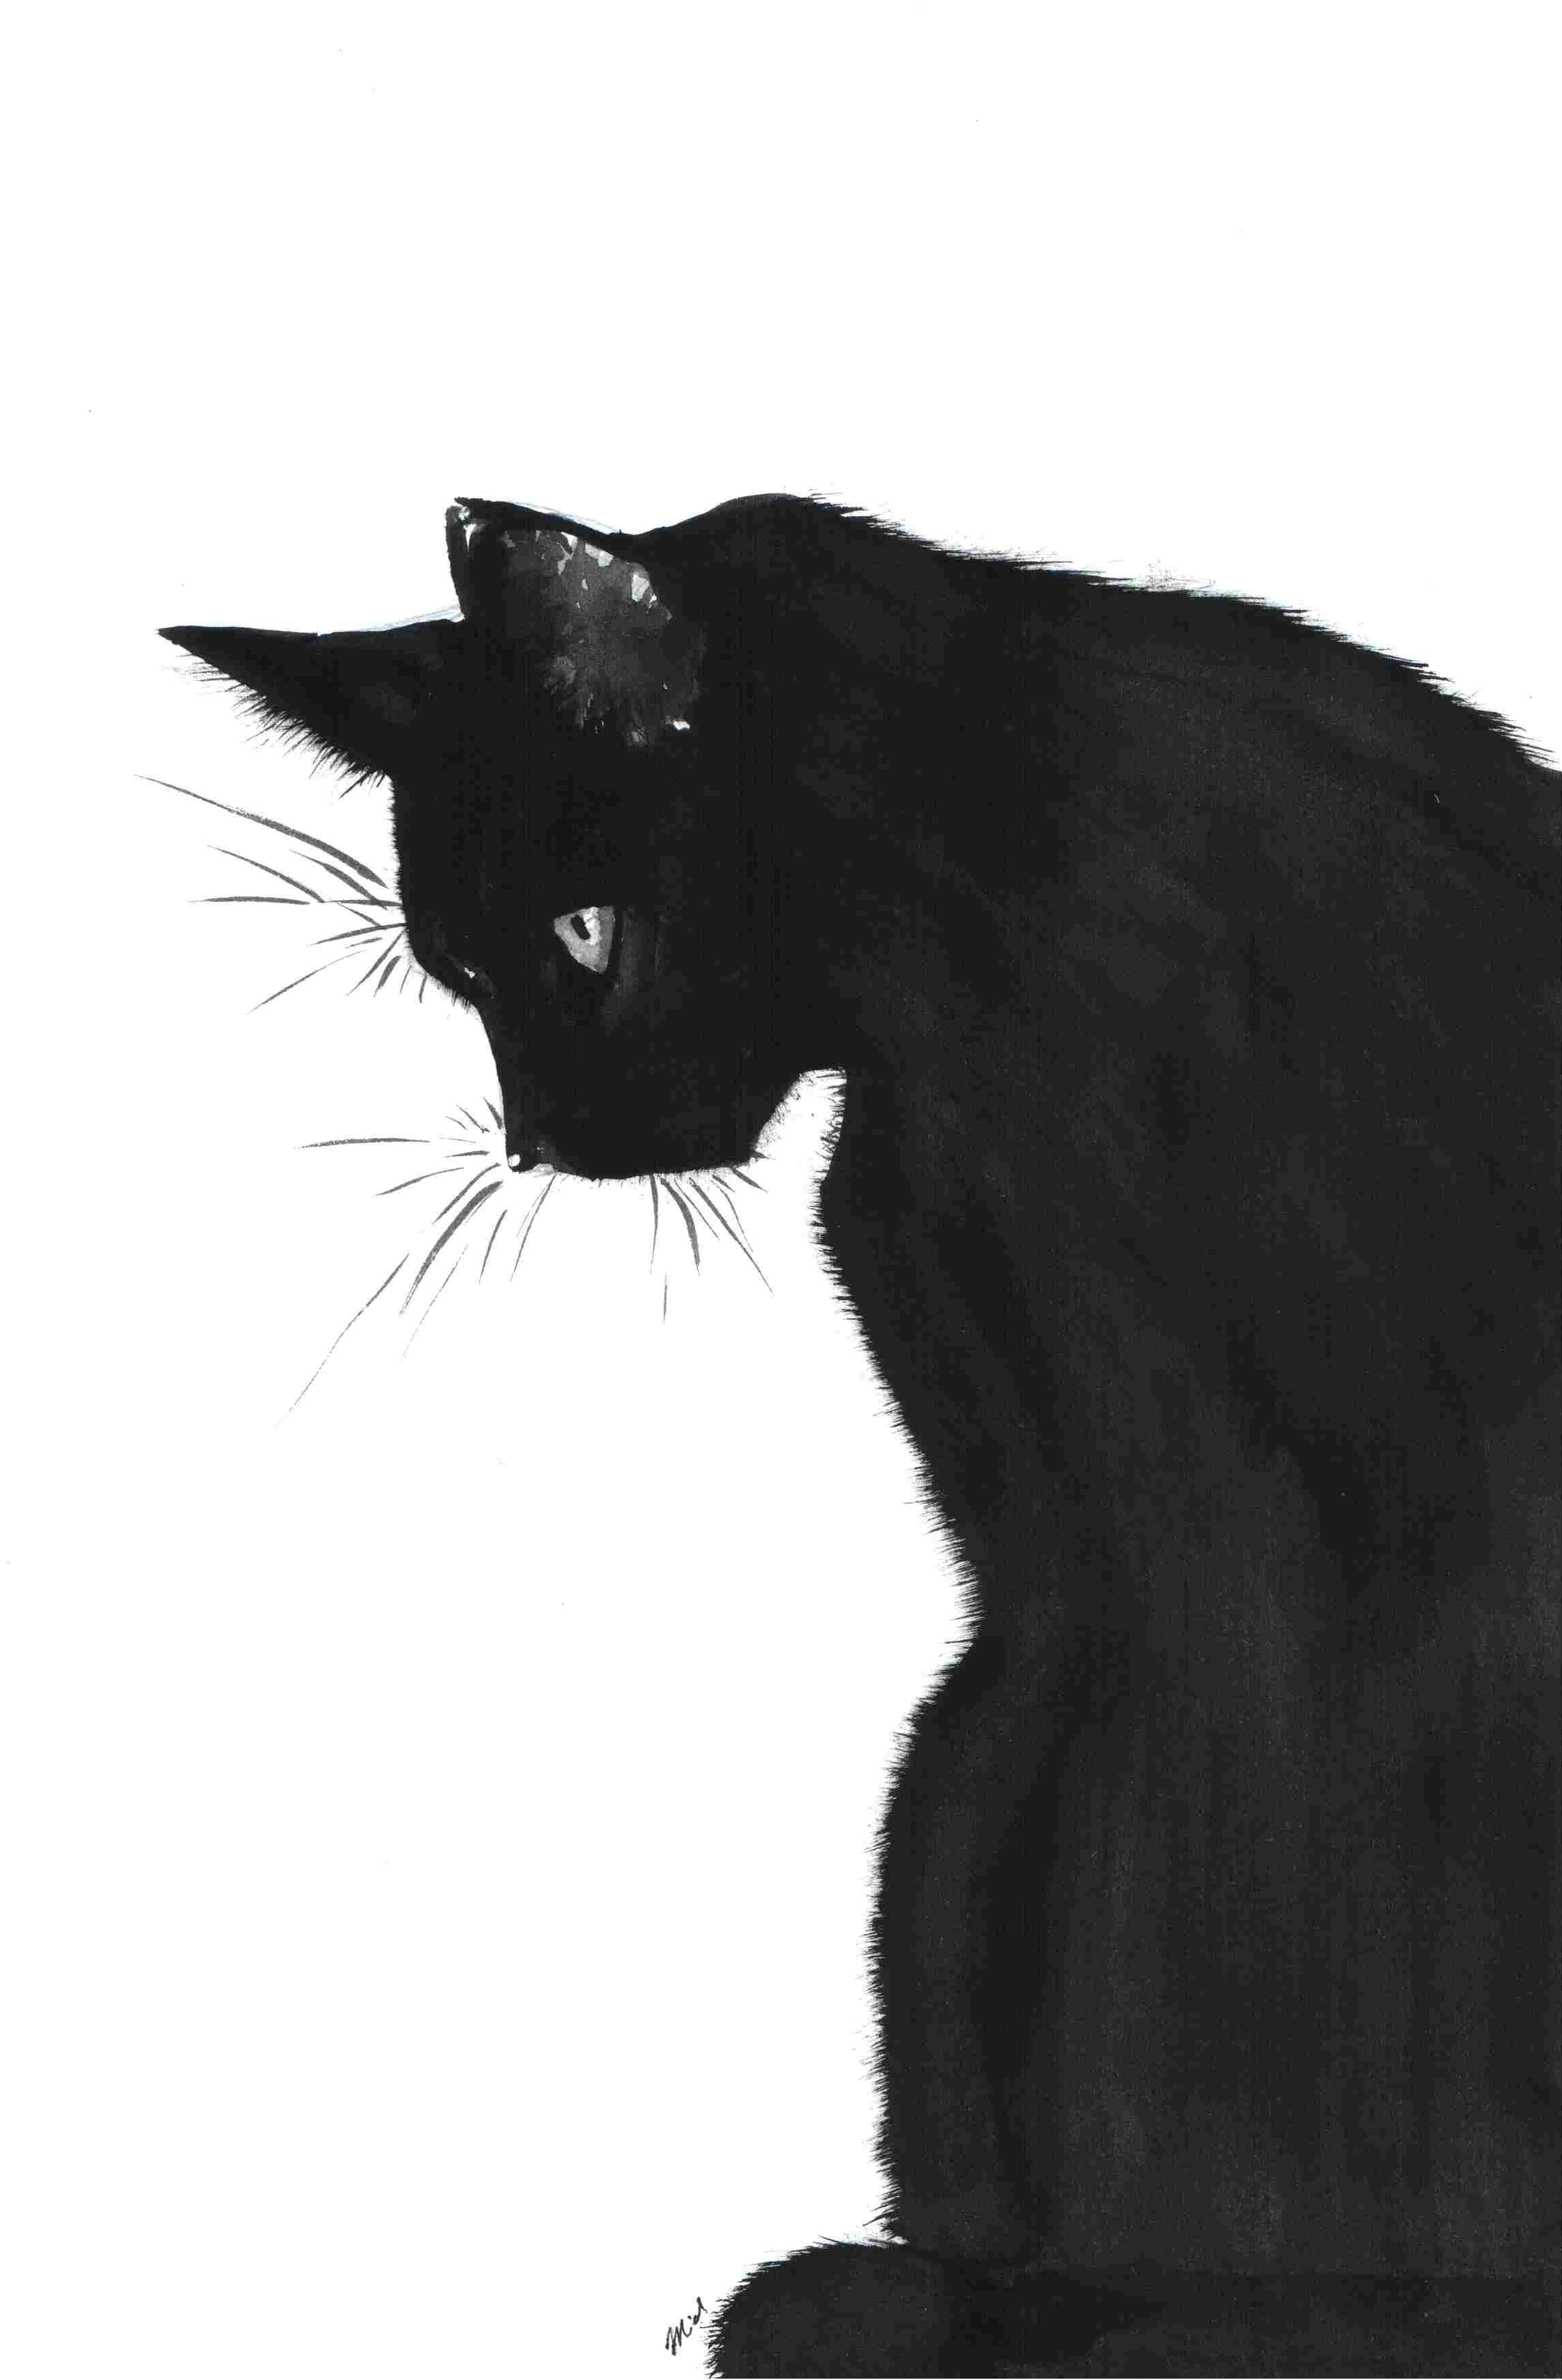 Black Cat by ~Midniterain on deviantART